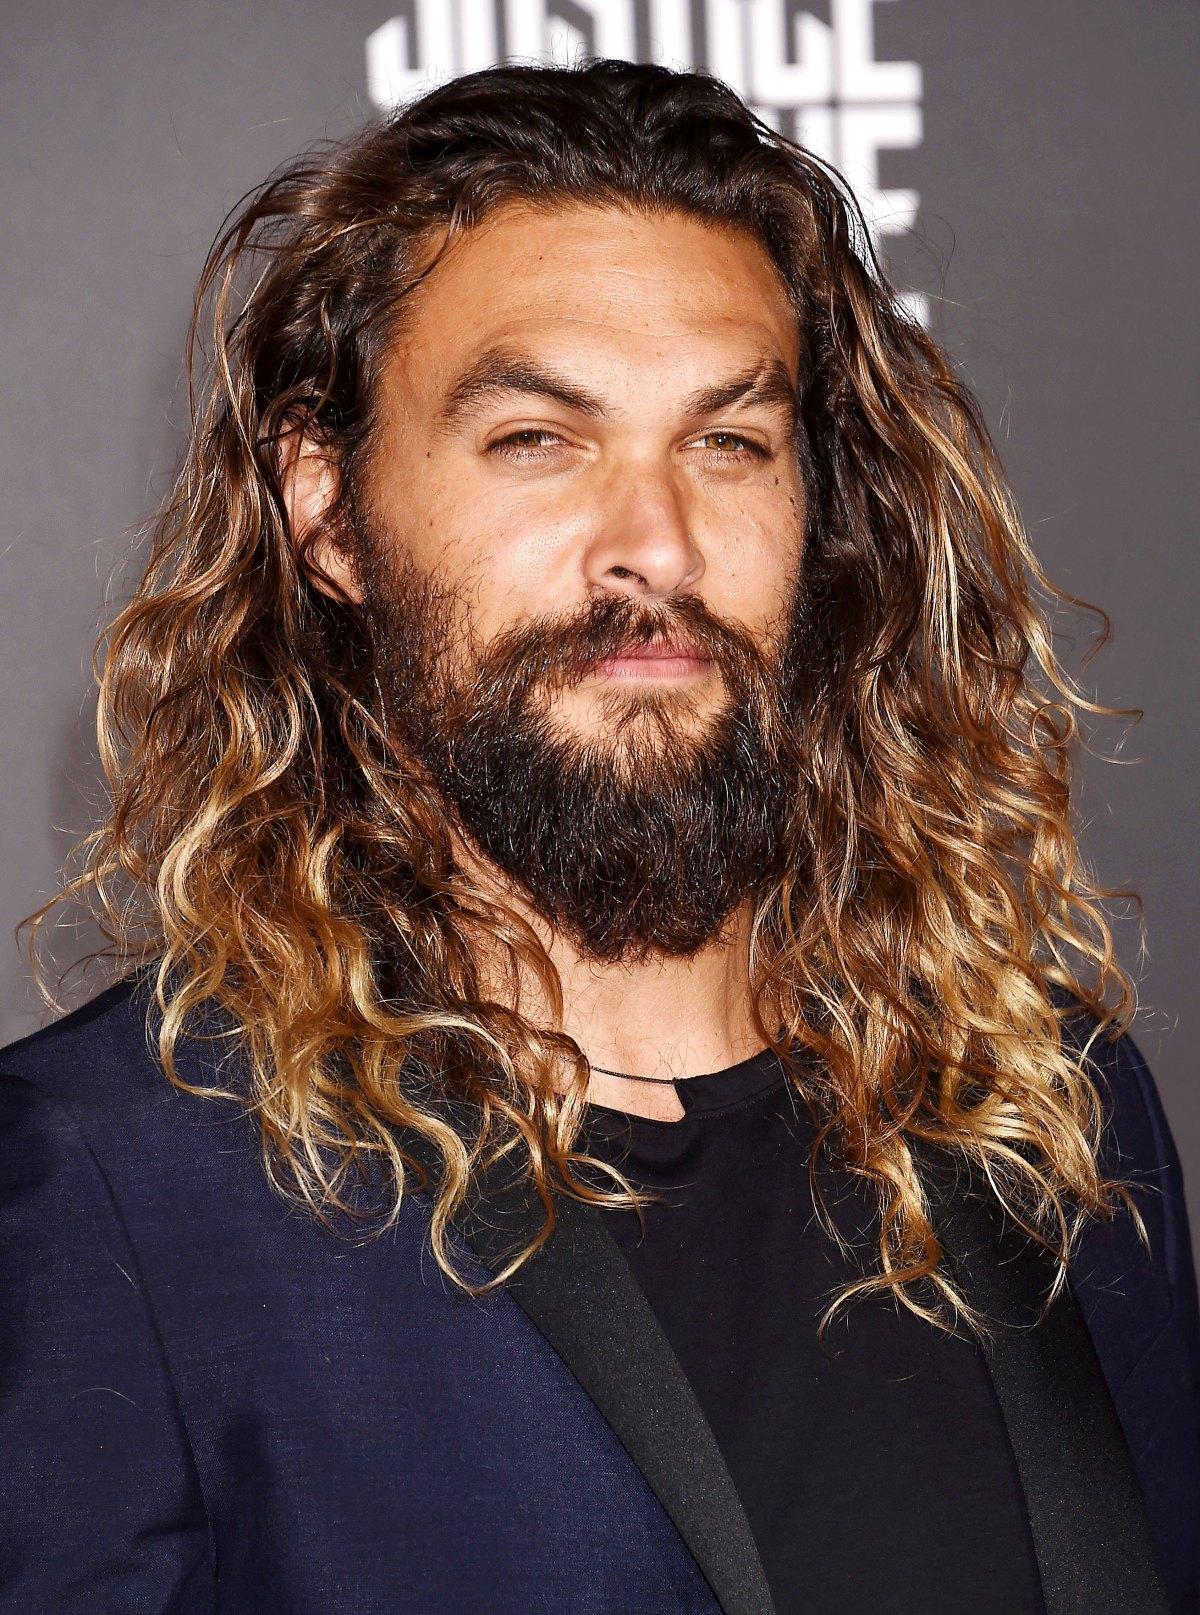 Jason Momoas Hair Evolution From Short To Long Pics